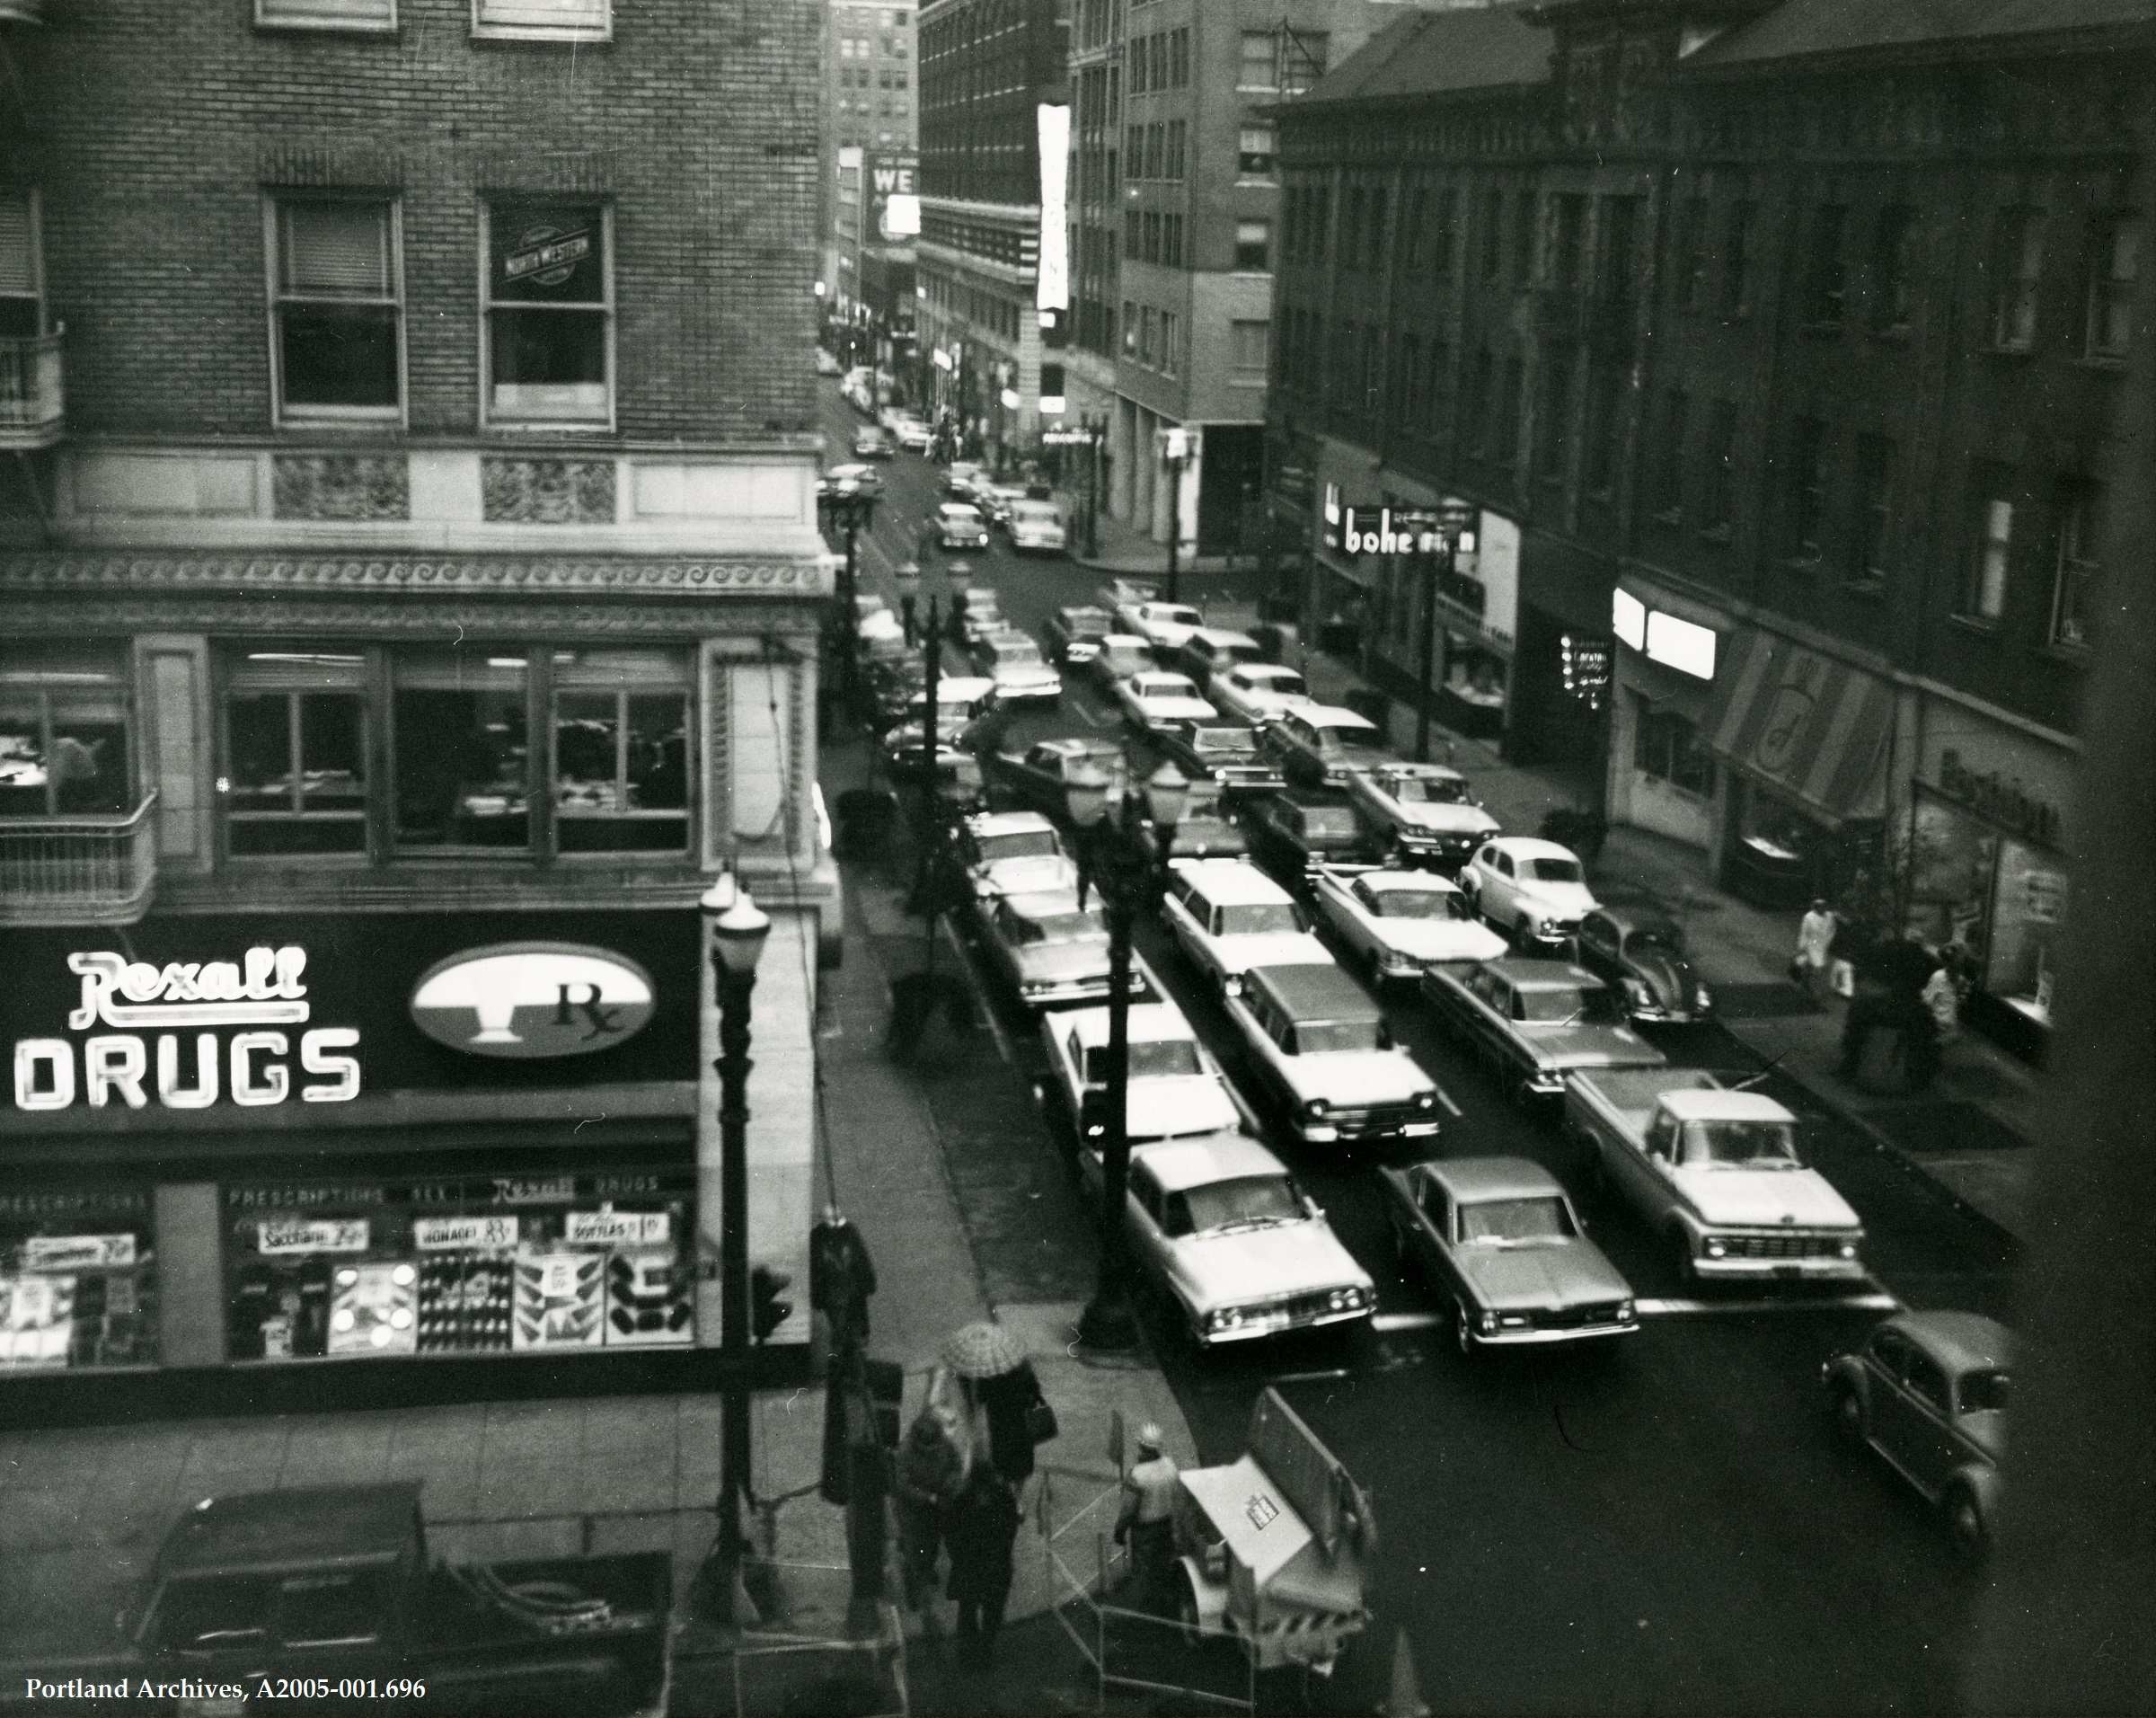 City of Portland Archives, Oregon, A2005-001.696